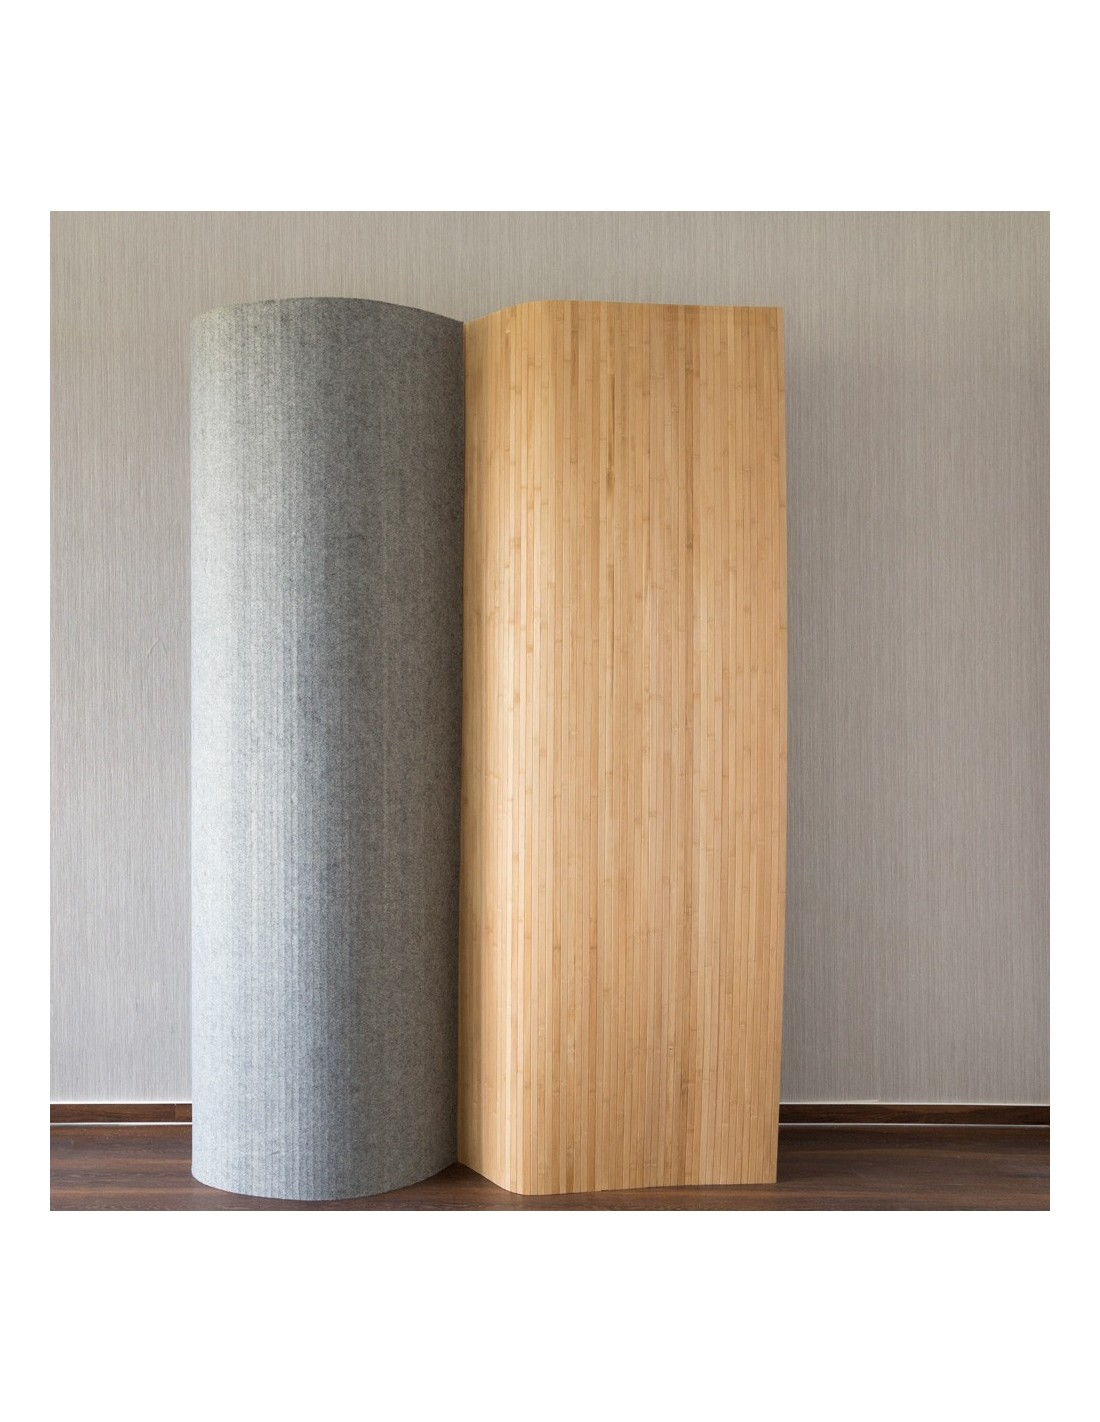 Full Size of Bambus Paravent Raumteiler Trennwand Garten Bett Wohnzimmer Paravent Bambus